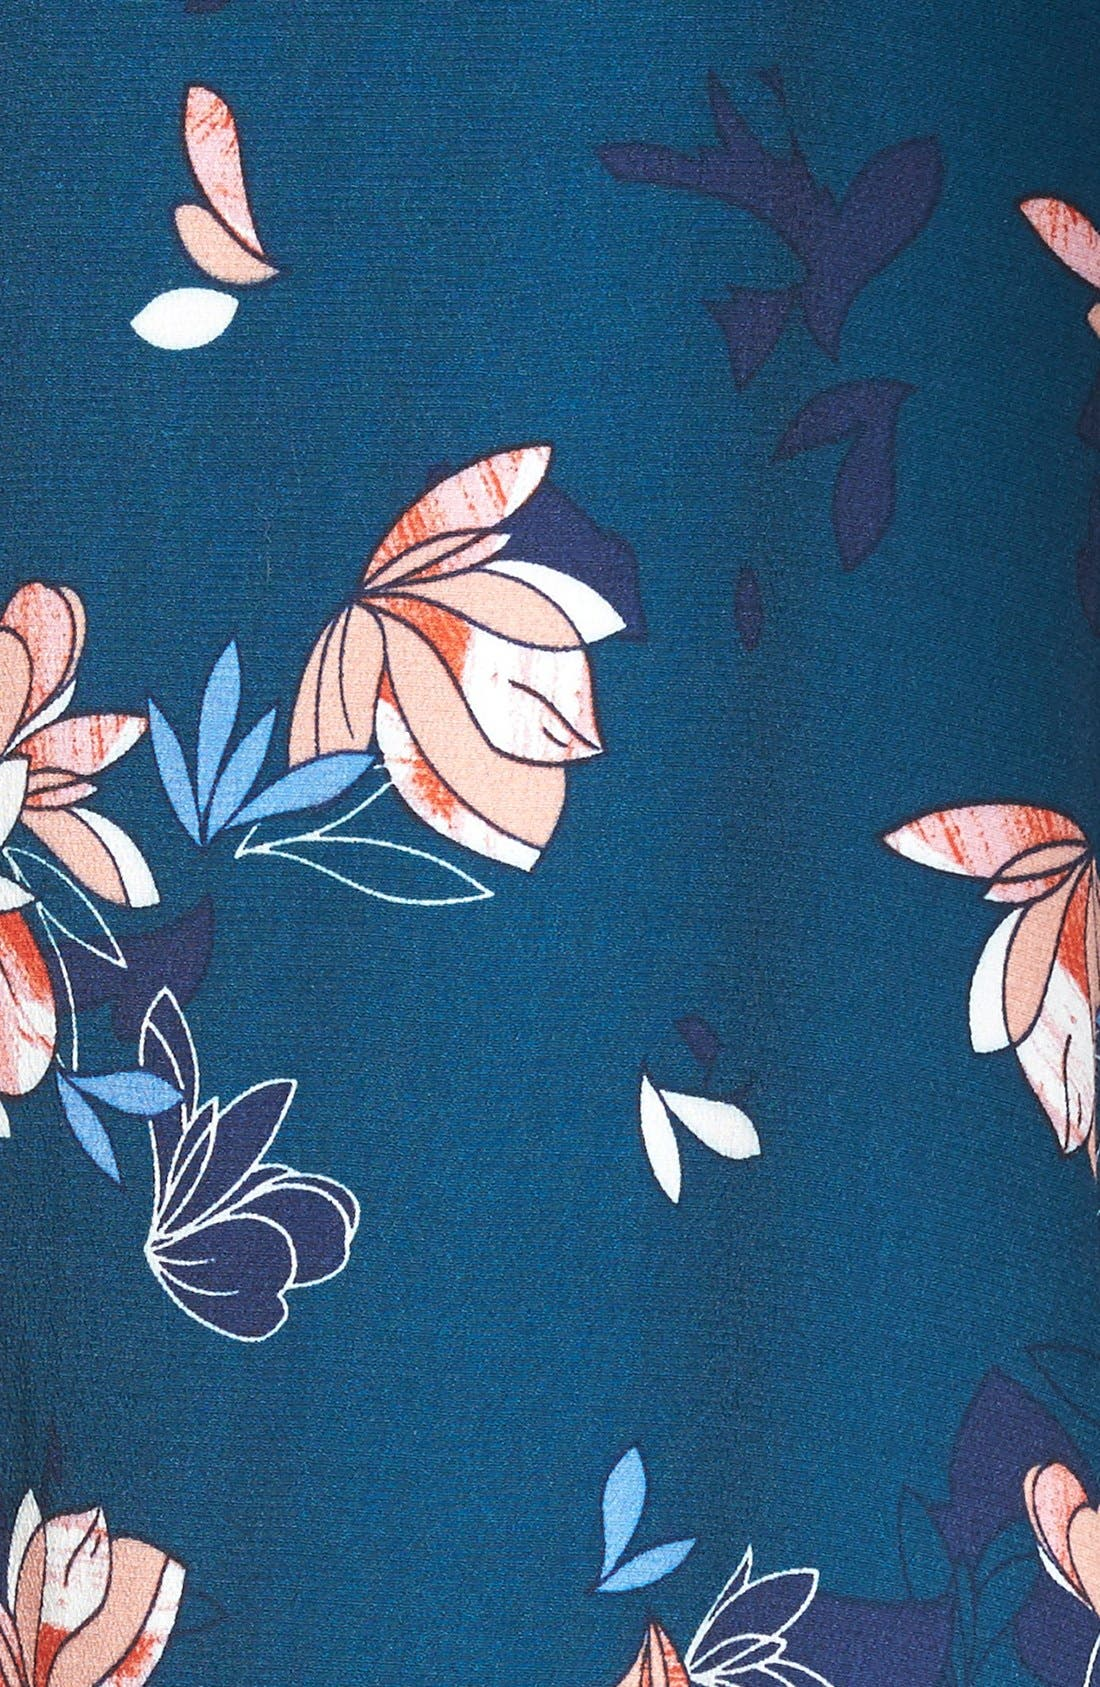 ASTR Wrap Front High/Low Dress,                             Alternate thumbnail 5, color,                             Teal Multi Floral